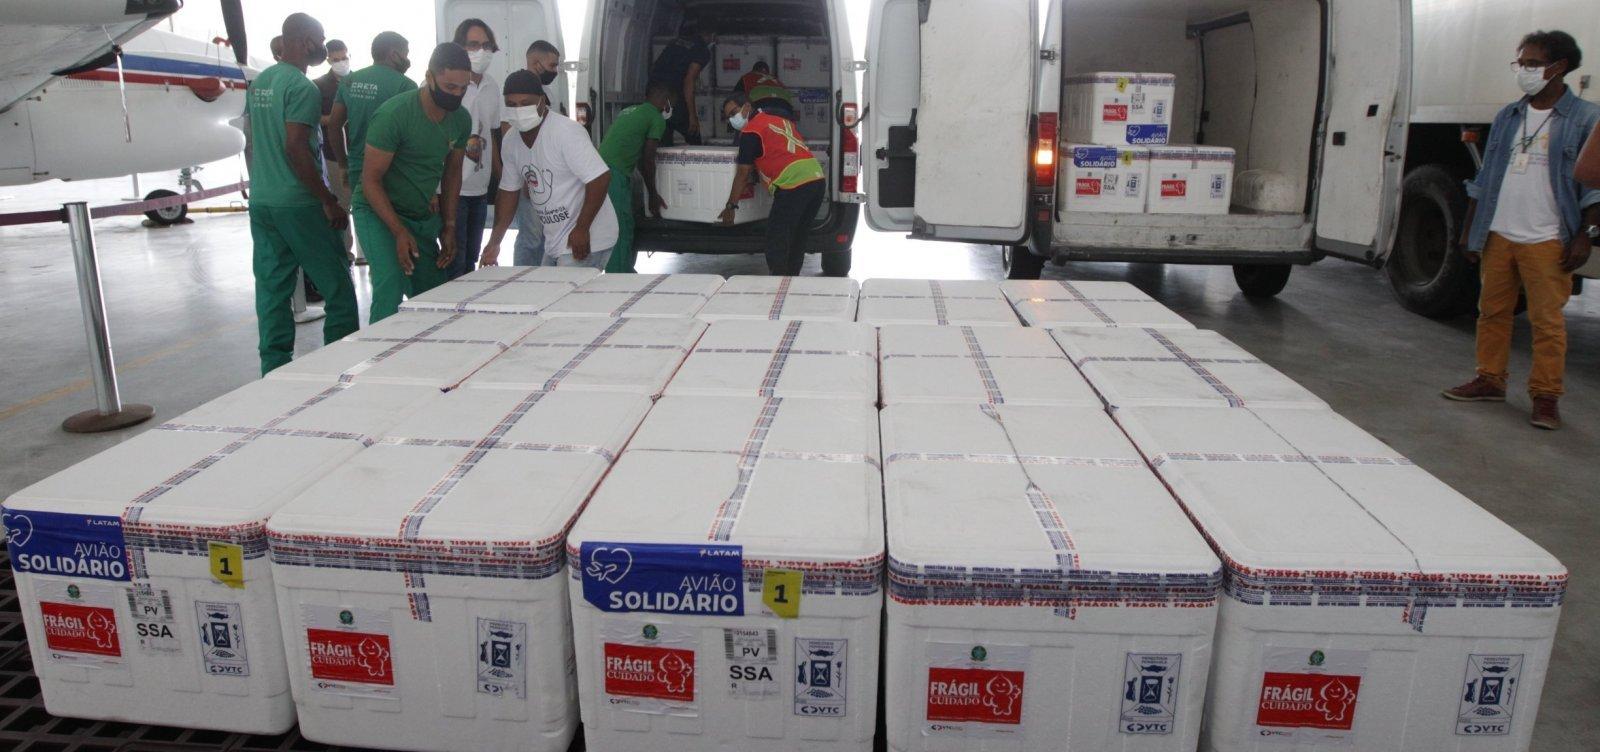 Bahia recebe mais de 80 mil doses de vacina da Pfizer